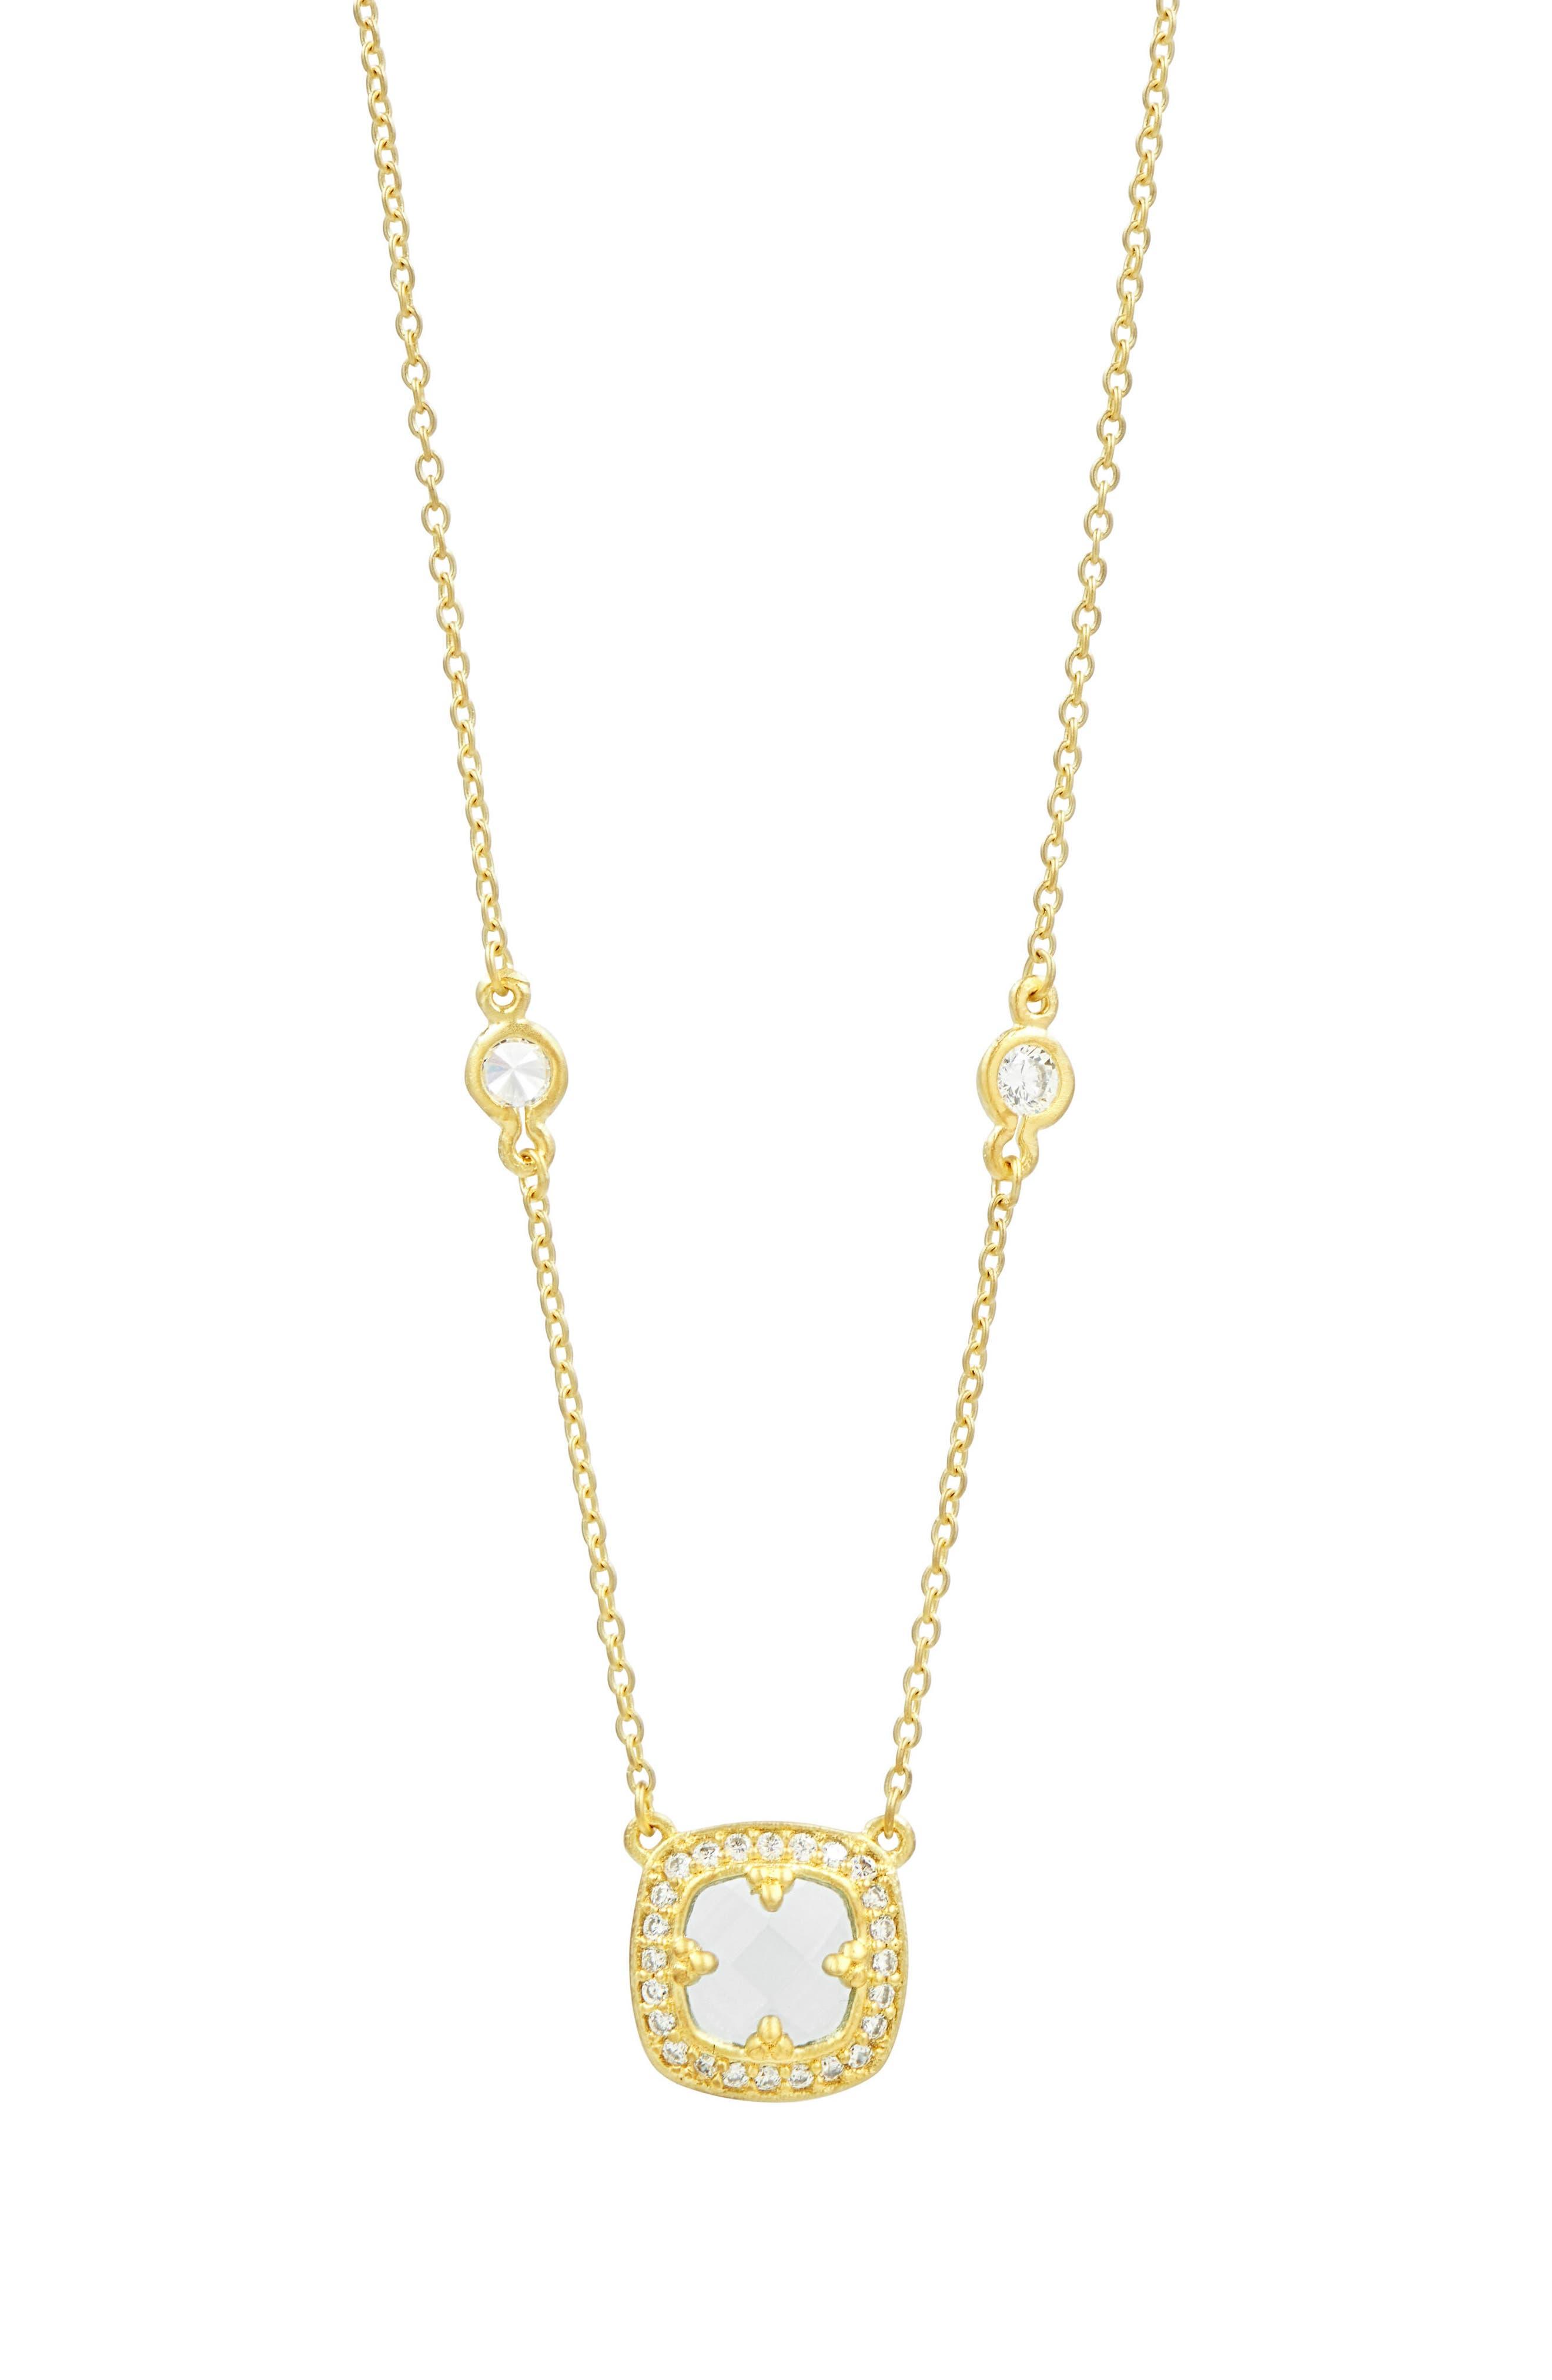 Alternate Image 1 Selected - FREIDA ROTHMAN Ocean Azure Cubic Zirconia Pendant Necklace